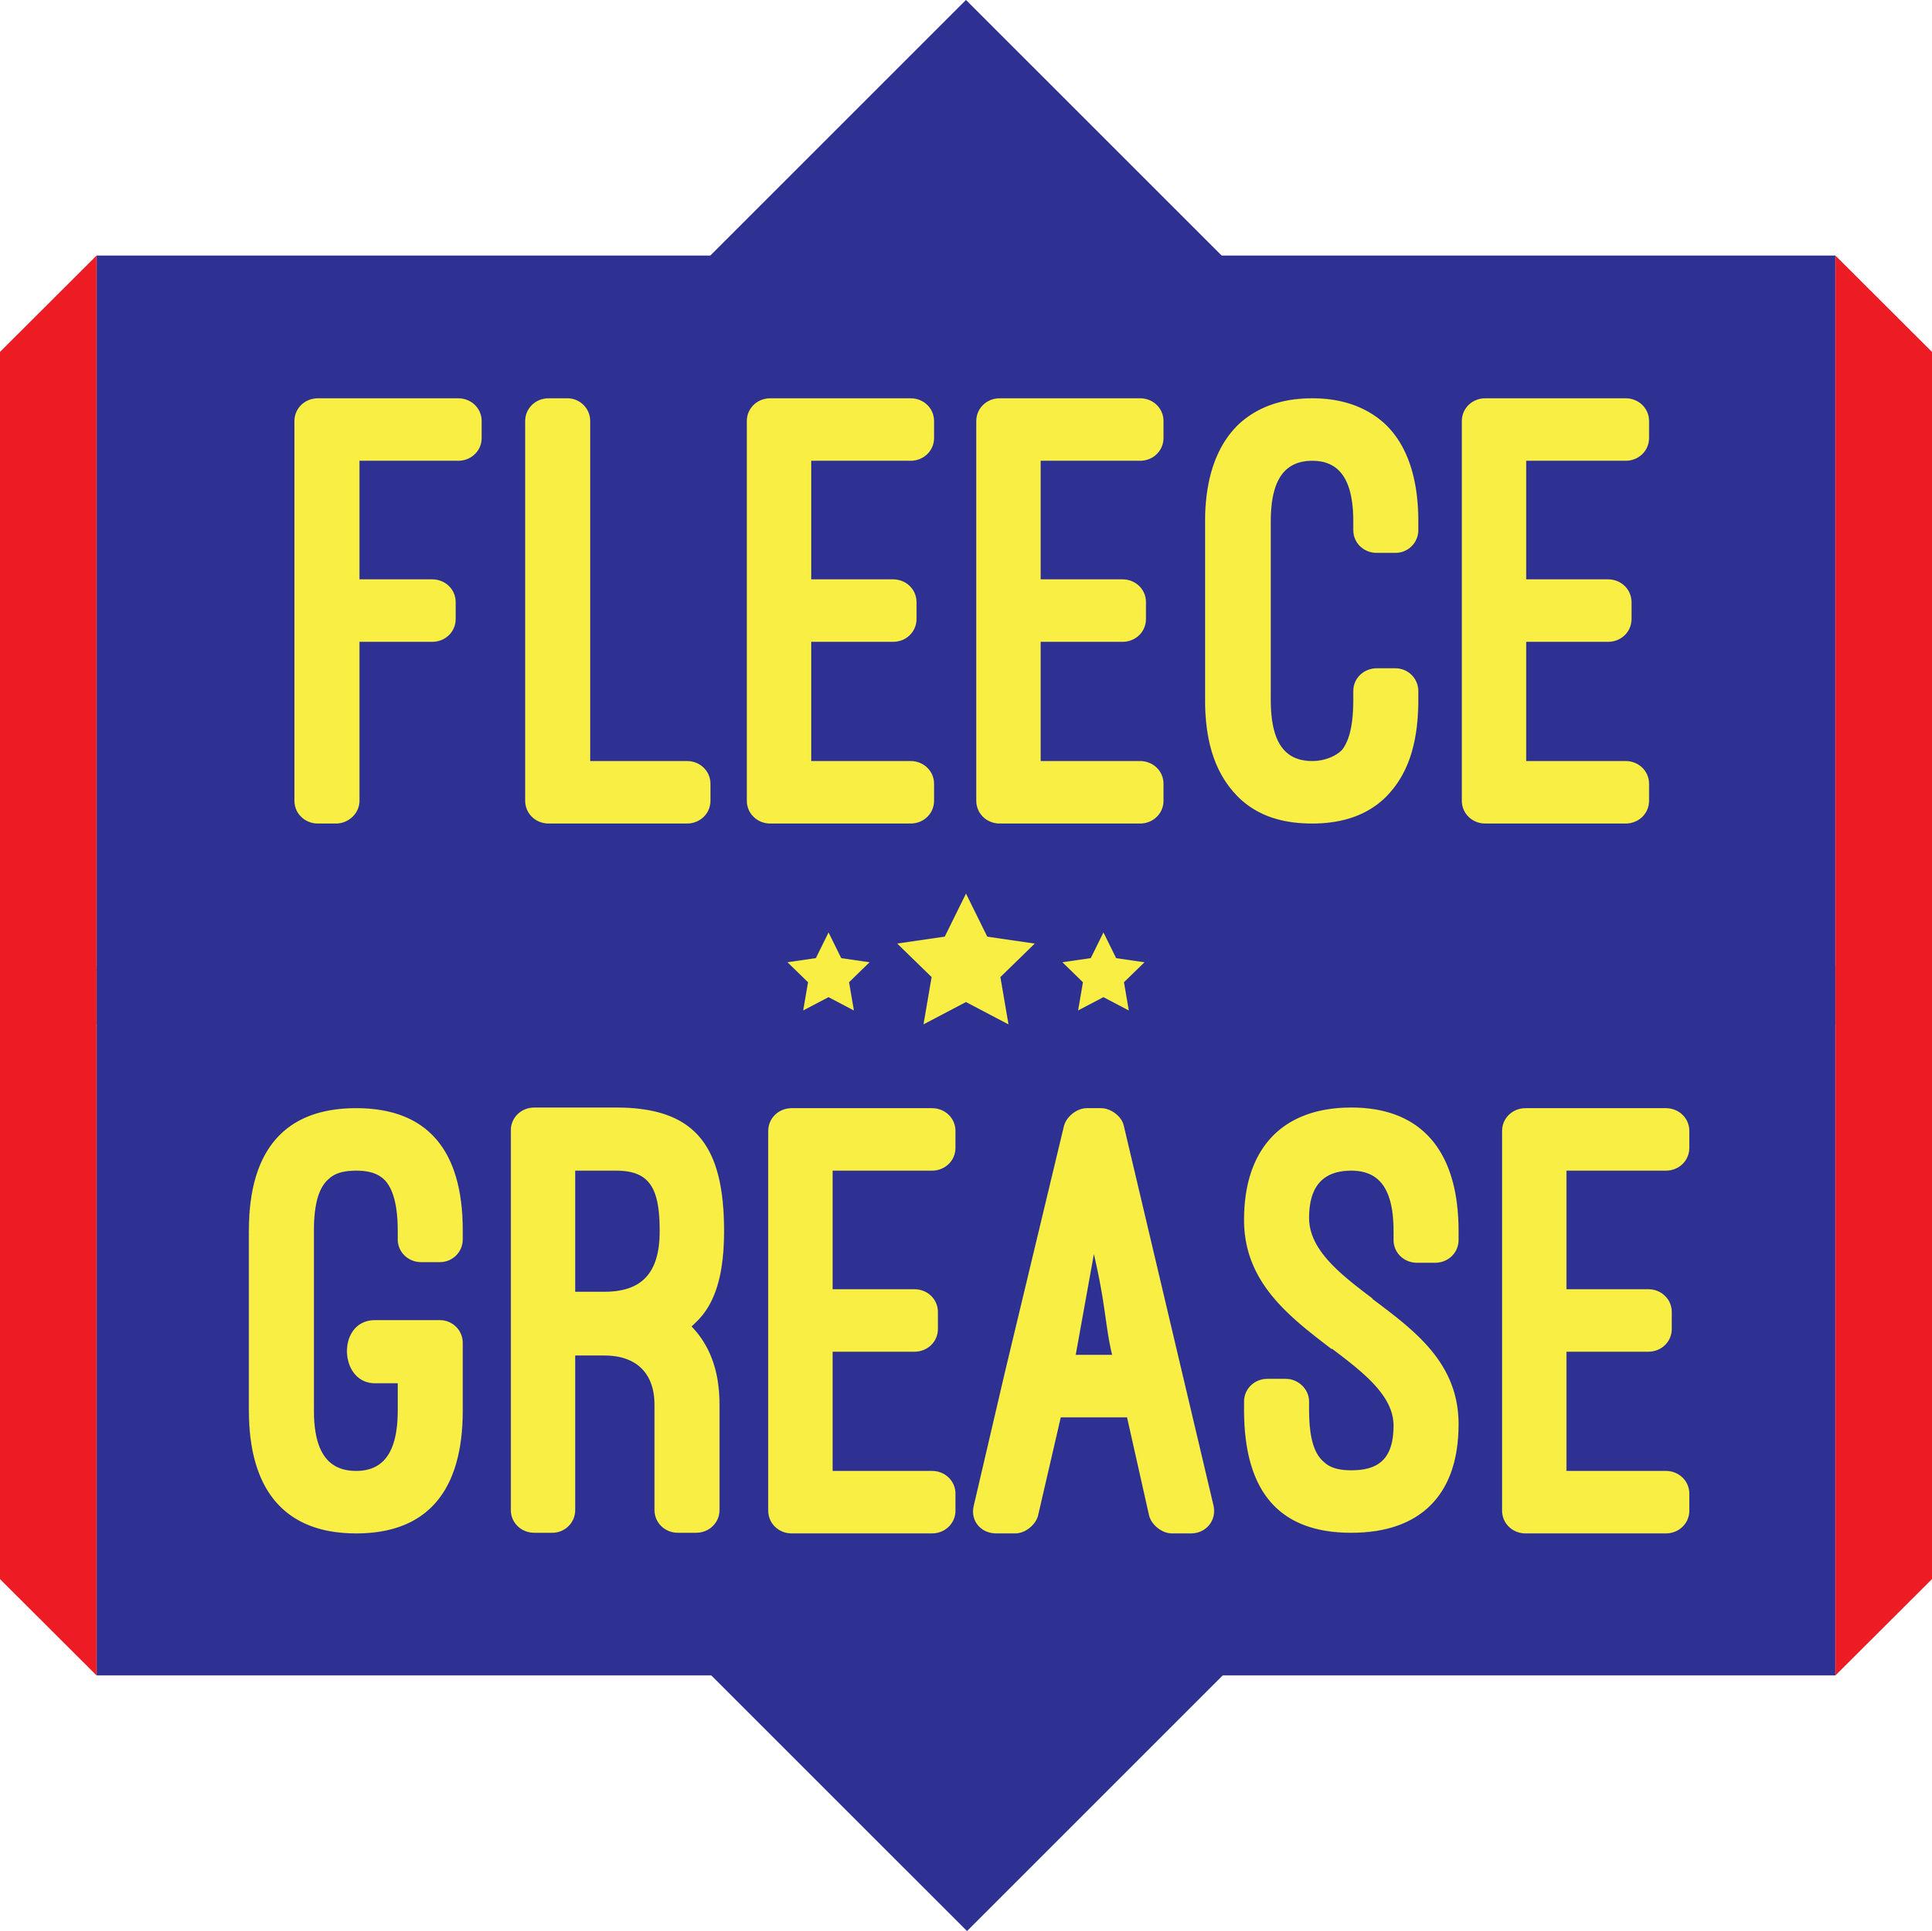 FLEECE GREASE.jpg